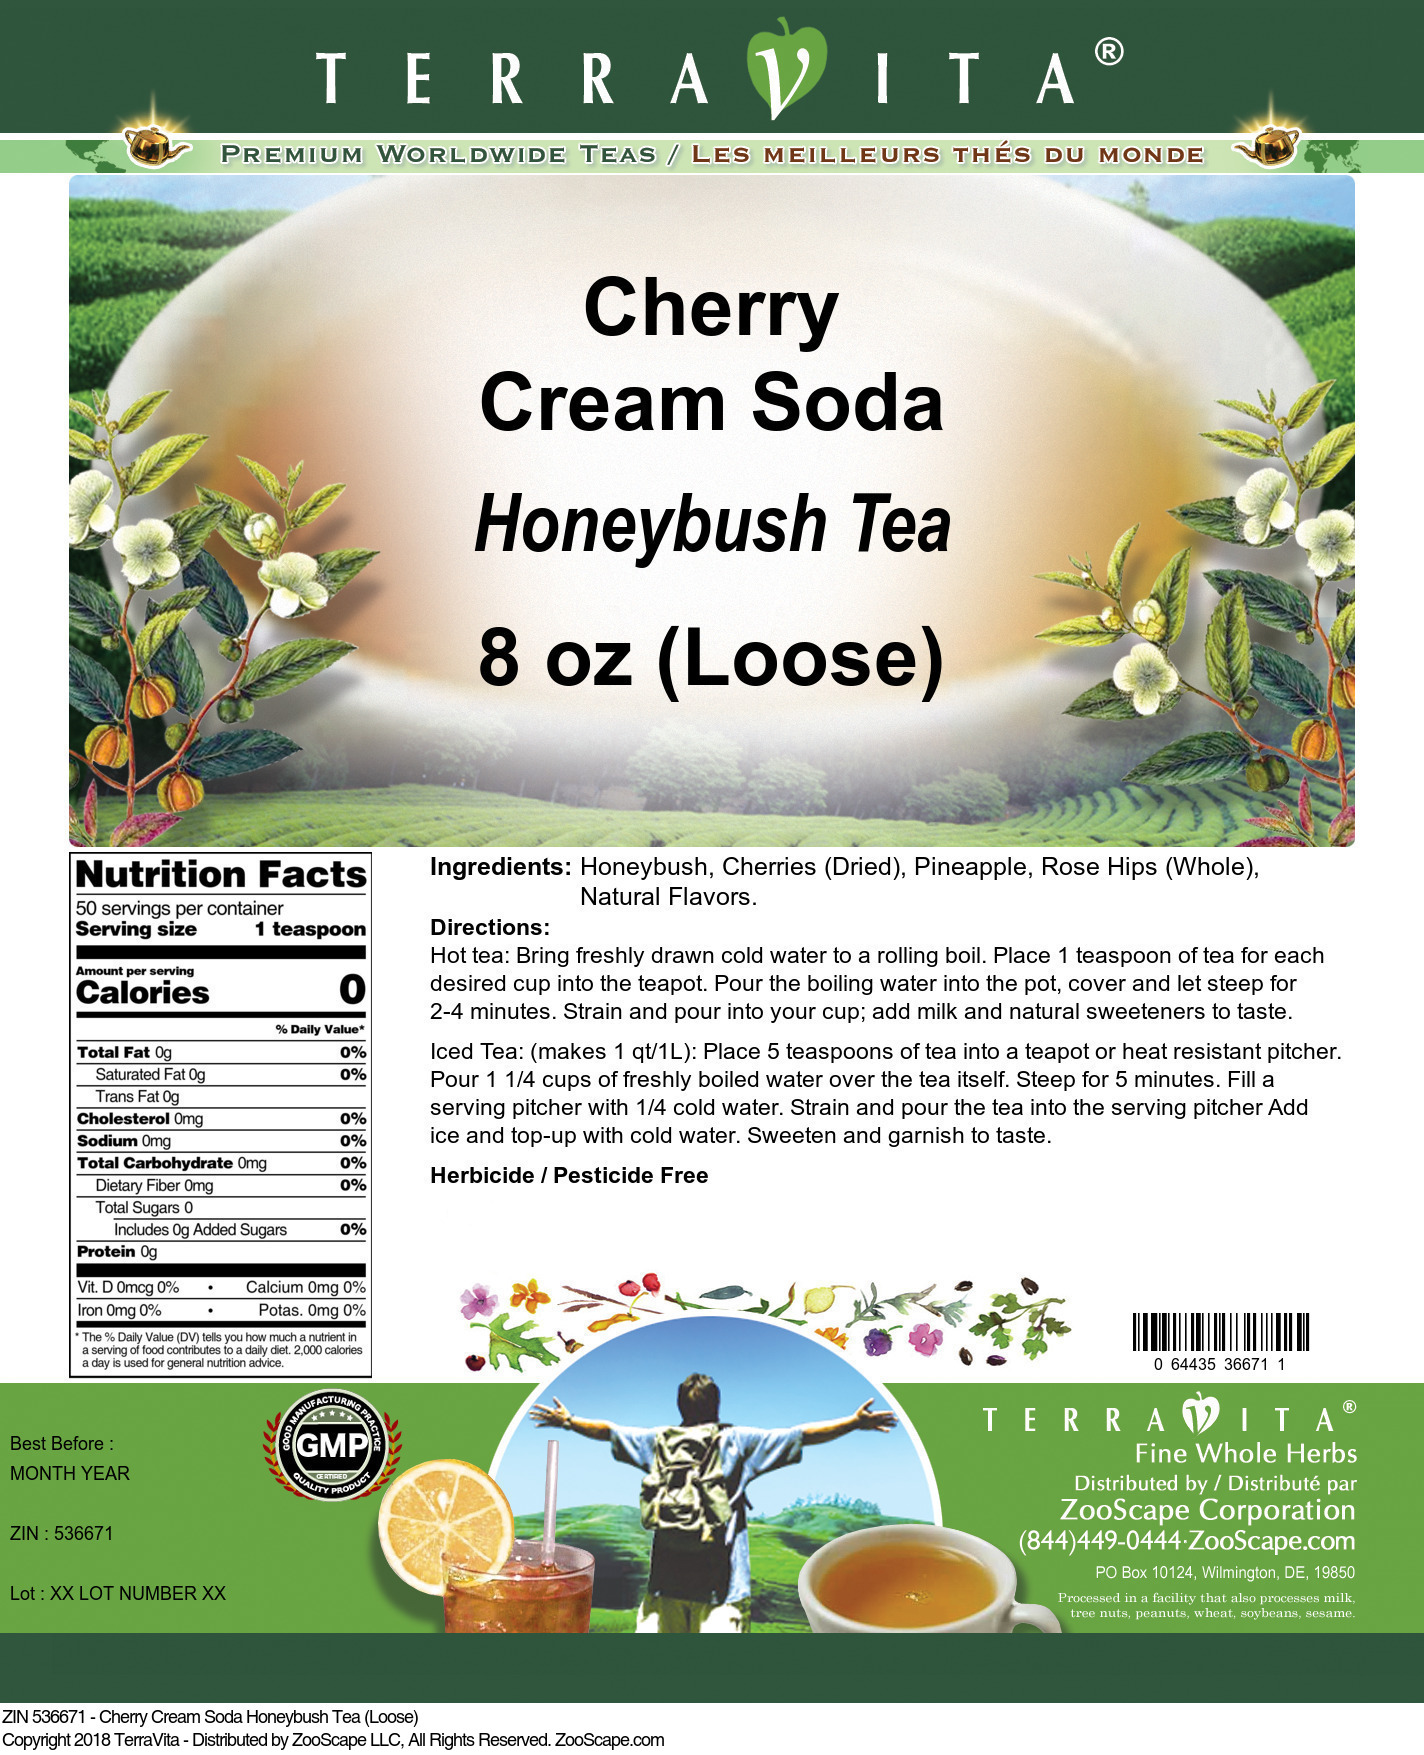 Cherry Cream Soda Honeybush Tea